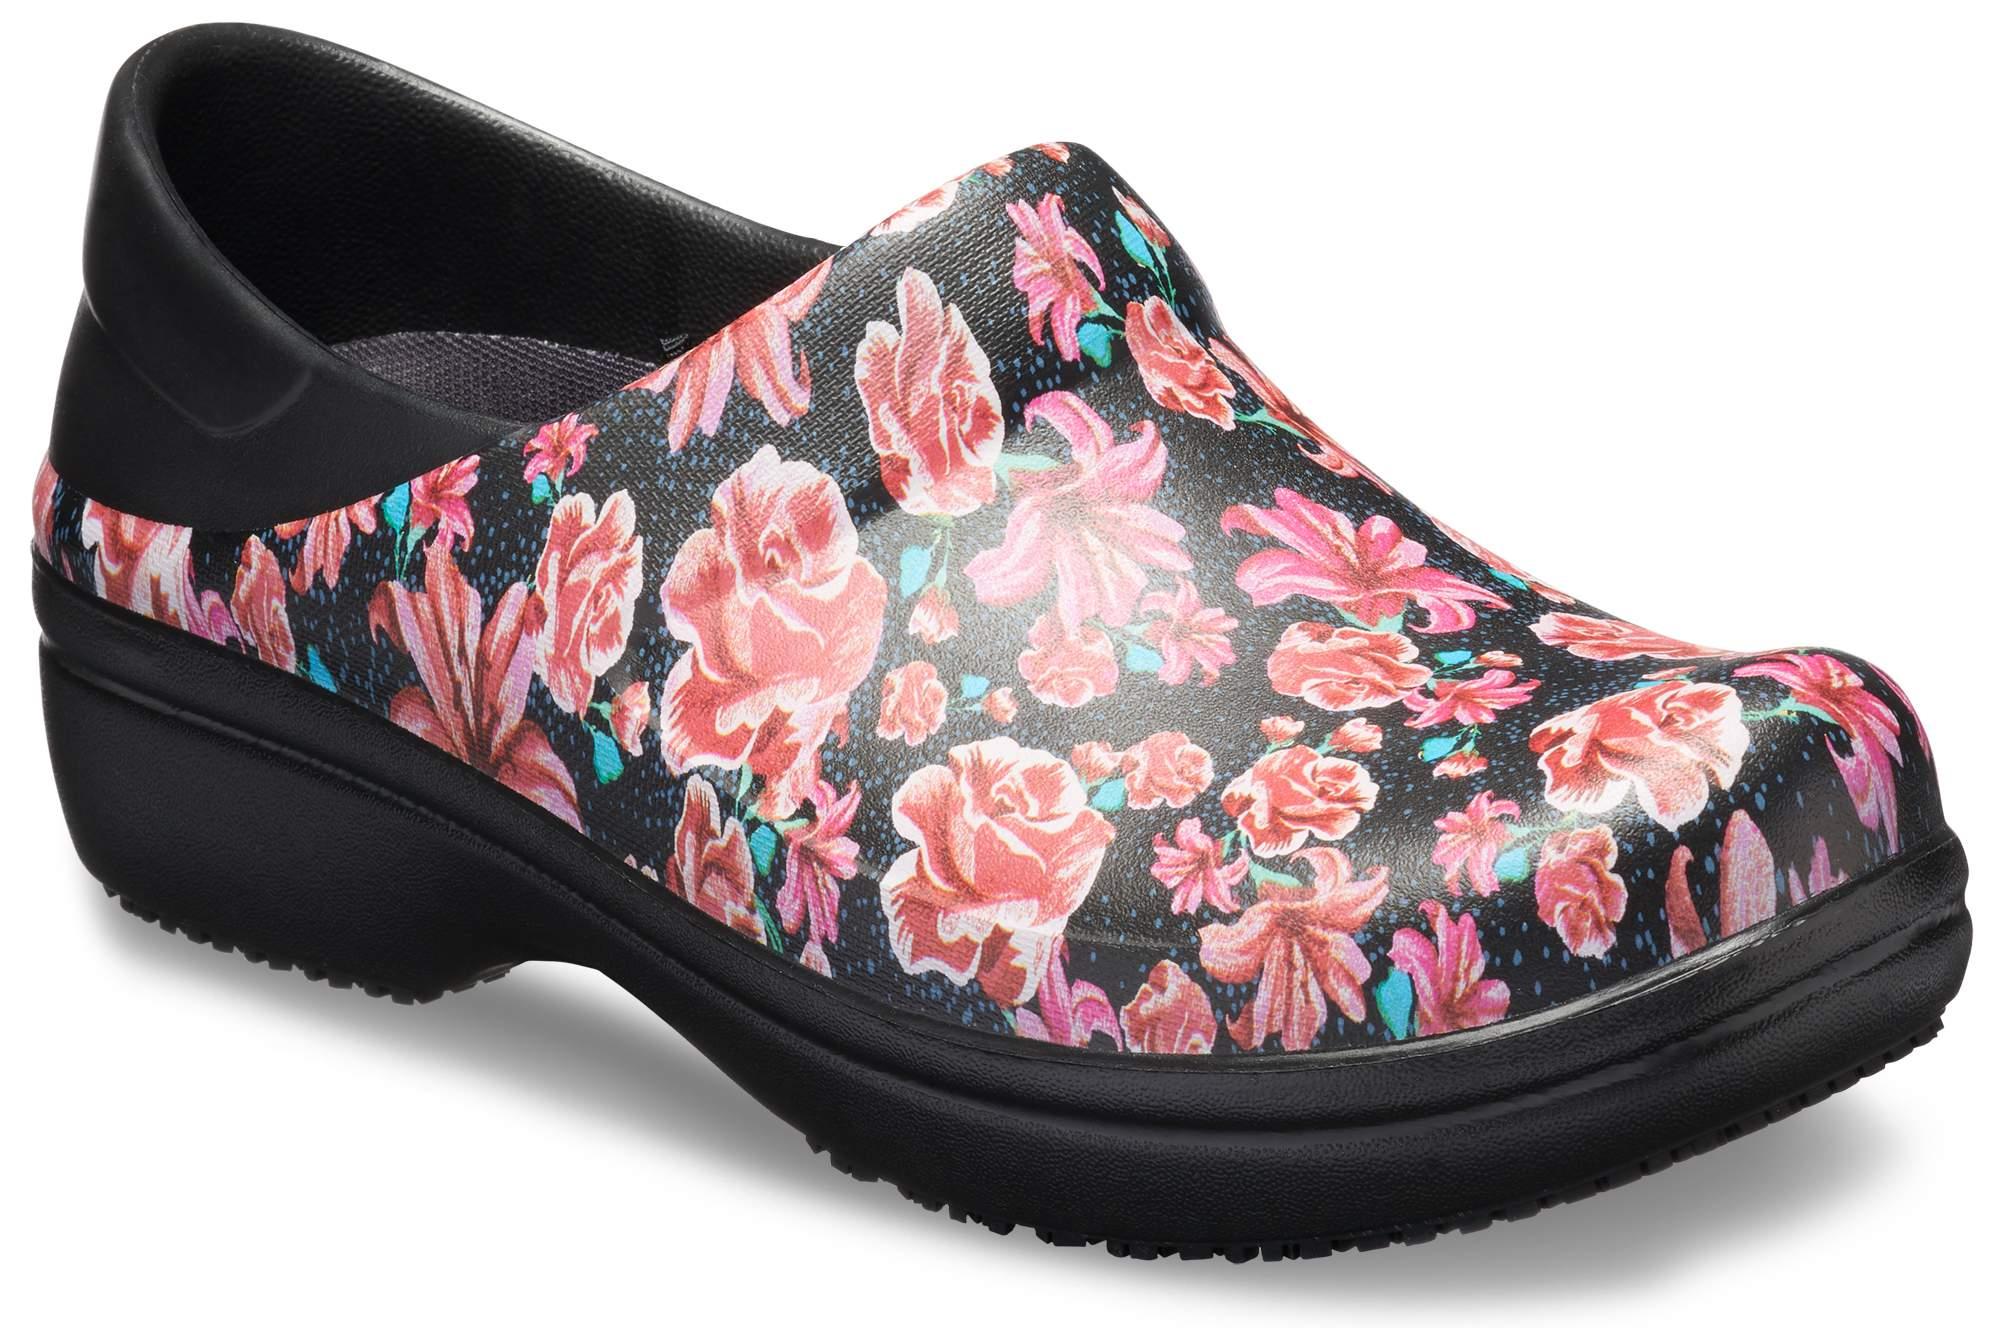 Crocs Neria Pro Women's Clogs